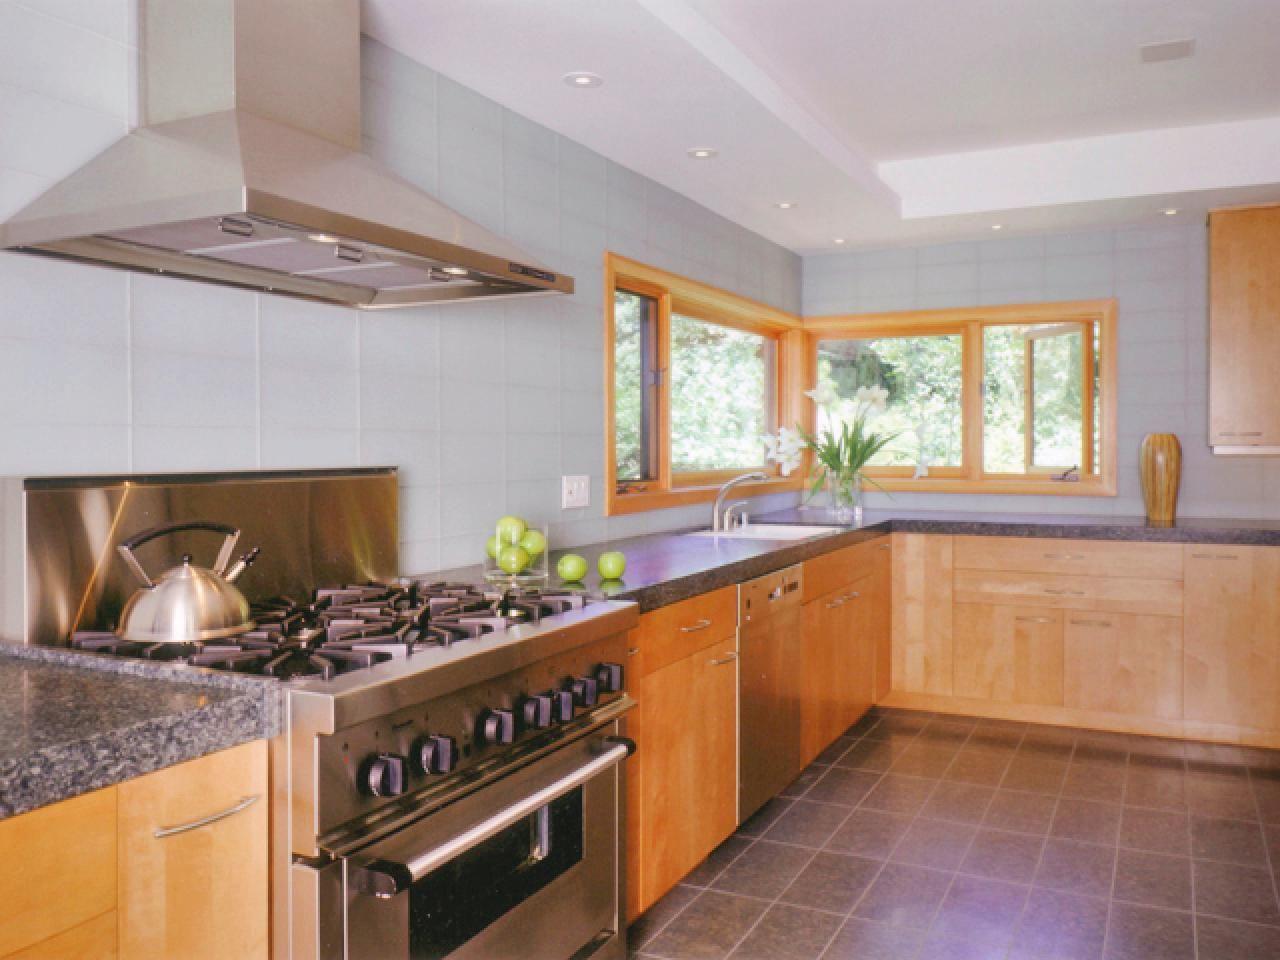 Kitchen Layout Templates 6 Different Designs Kitchen Design Kitchen Layout L Shaped Kitchen Designs